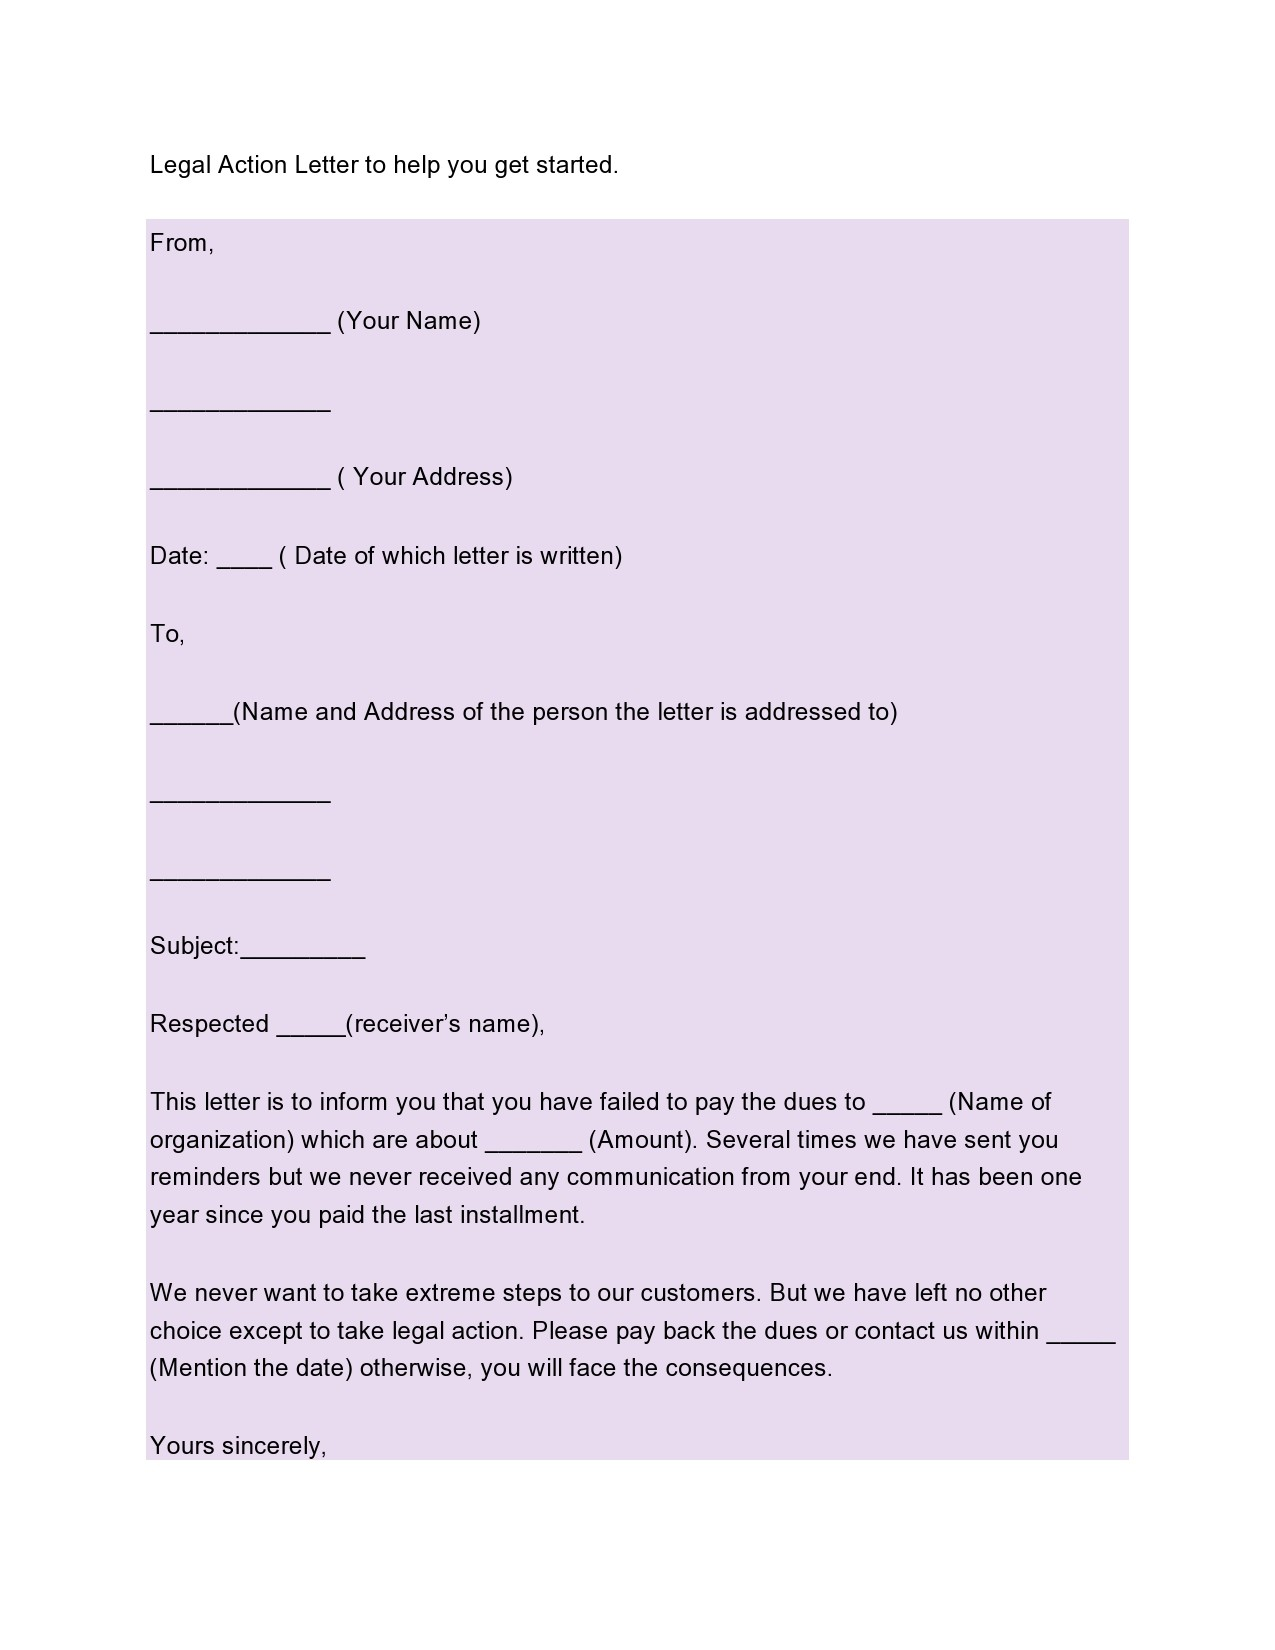 Free legal letter format 32